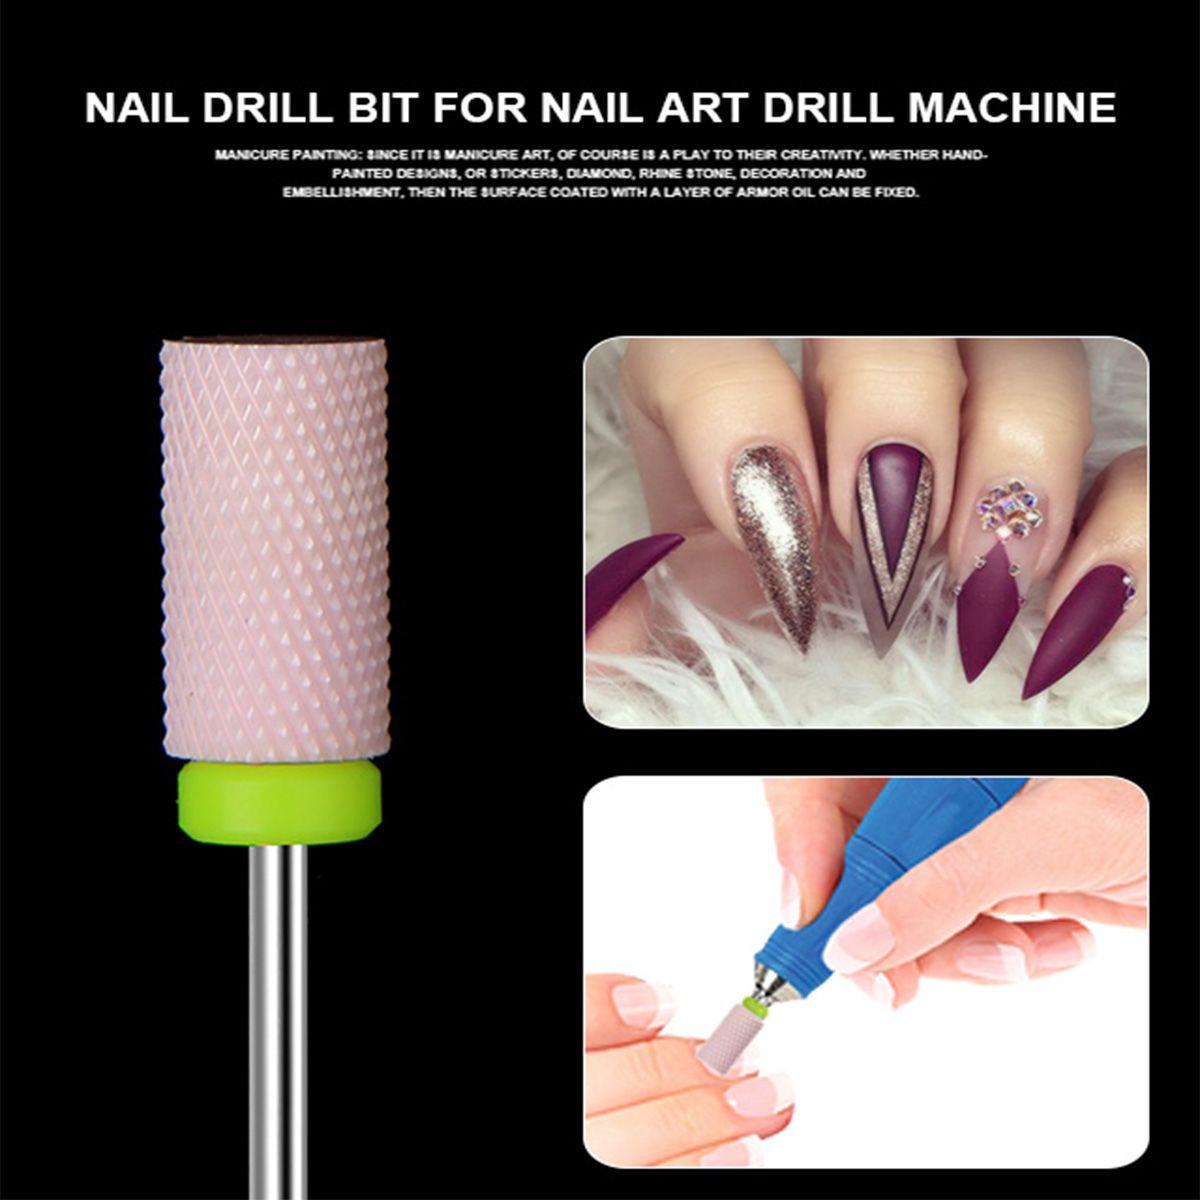 New Ceramic Nail Art Drill Bit For Electric Machine Nails Cuticle Gel Polish Remover Manicure